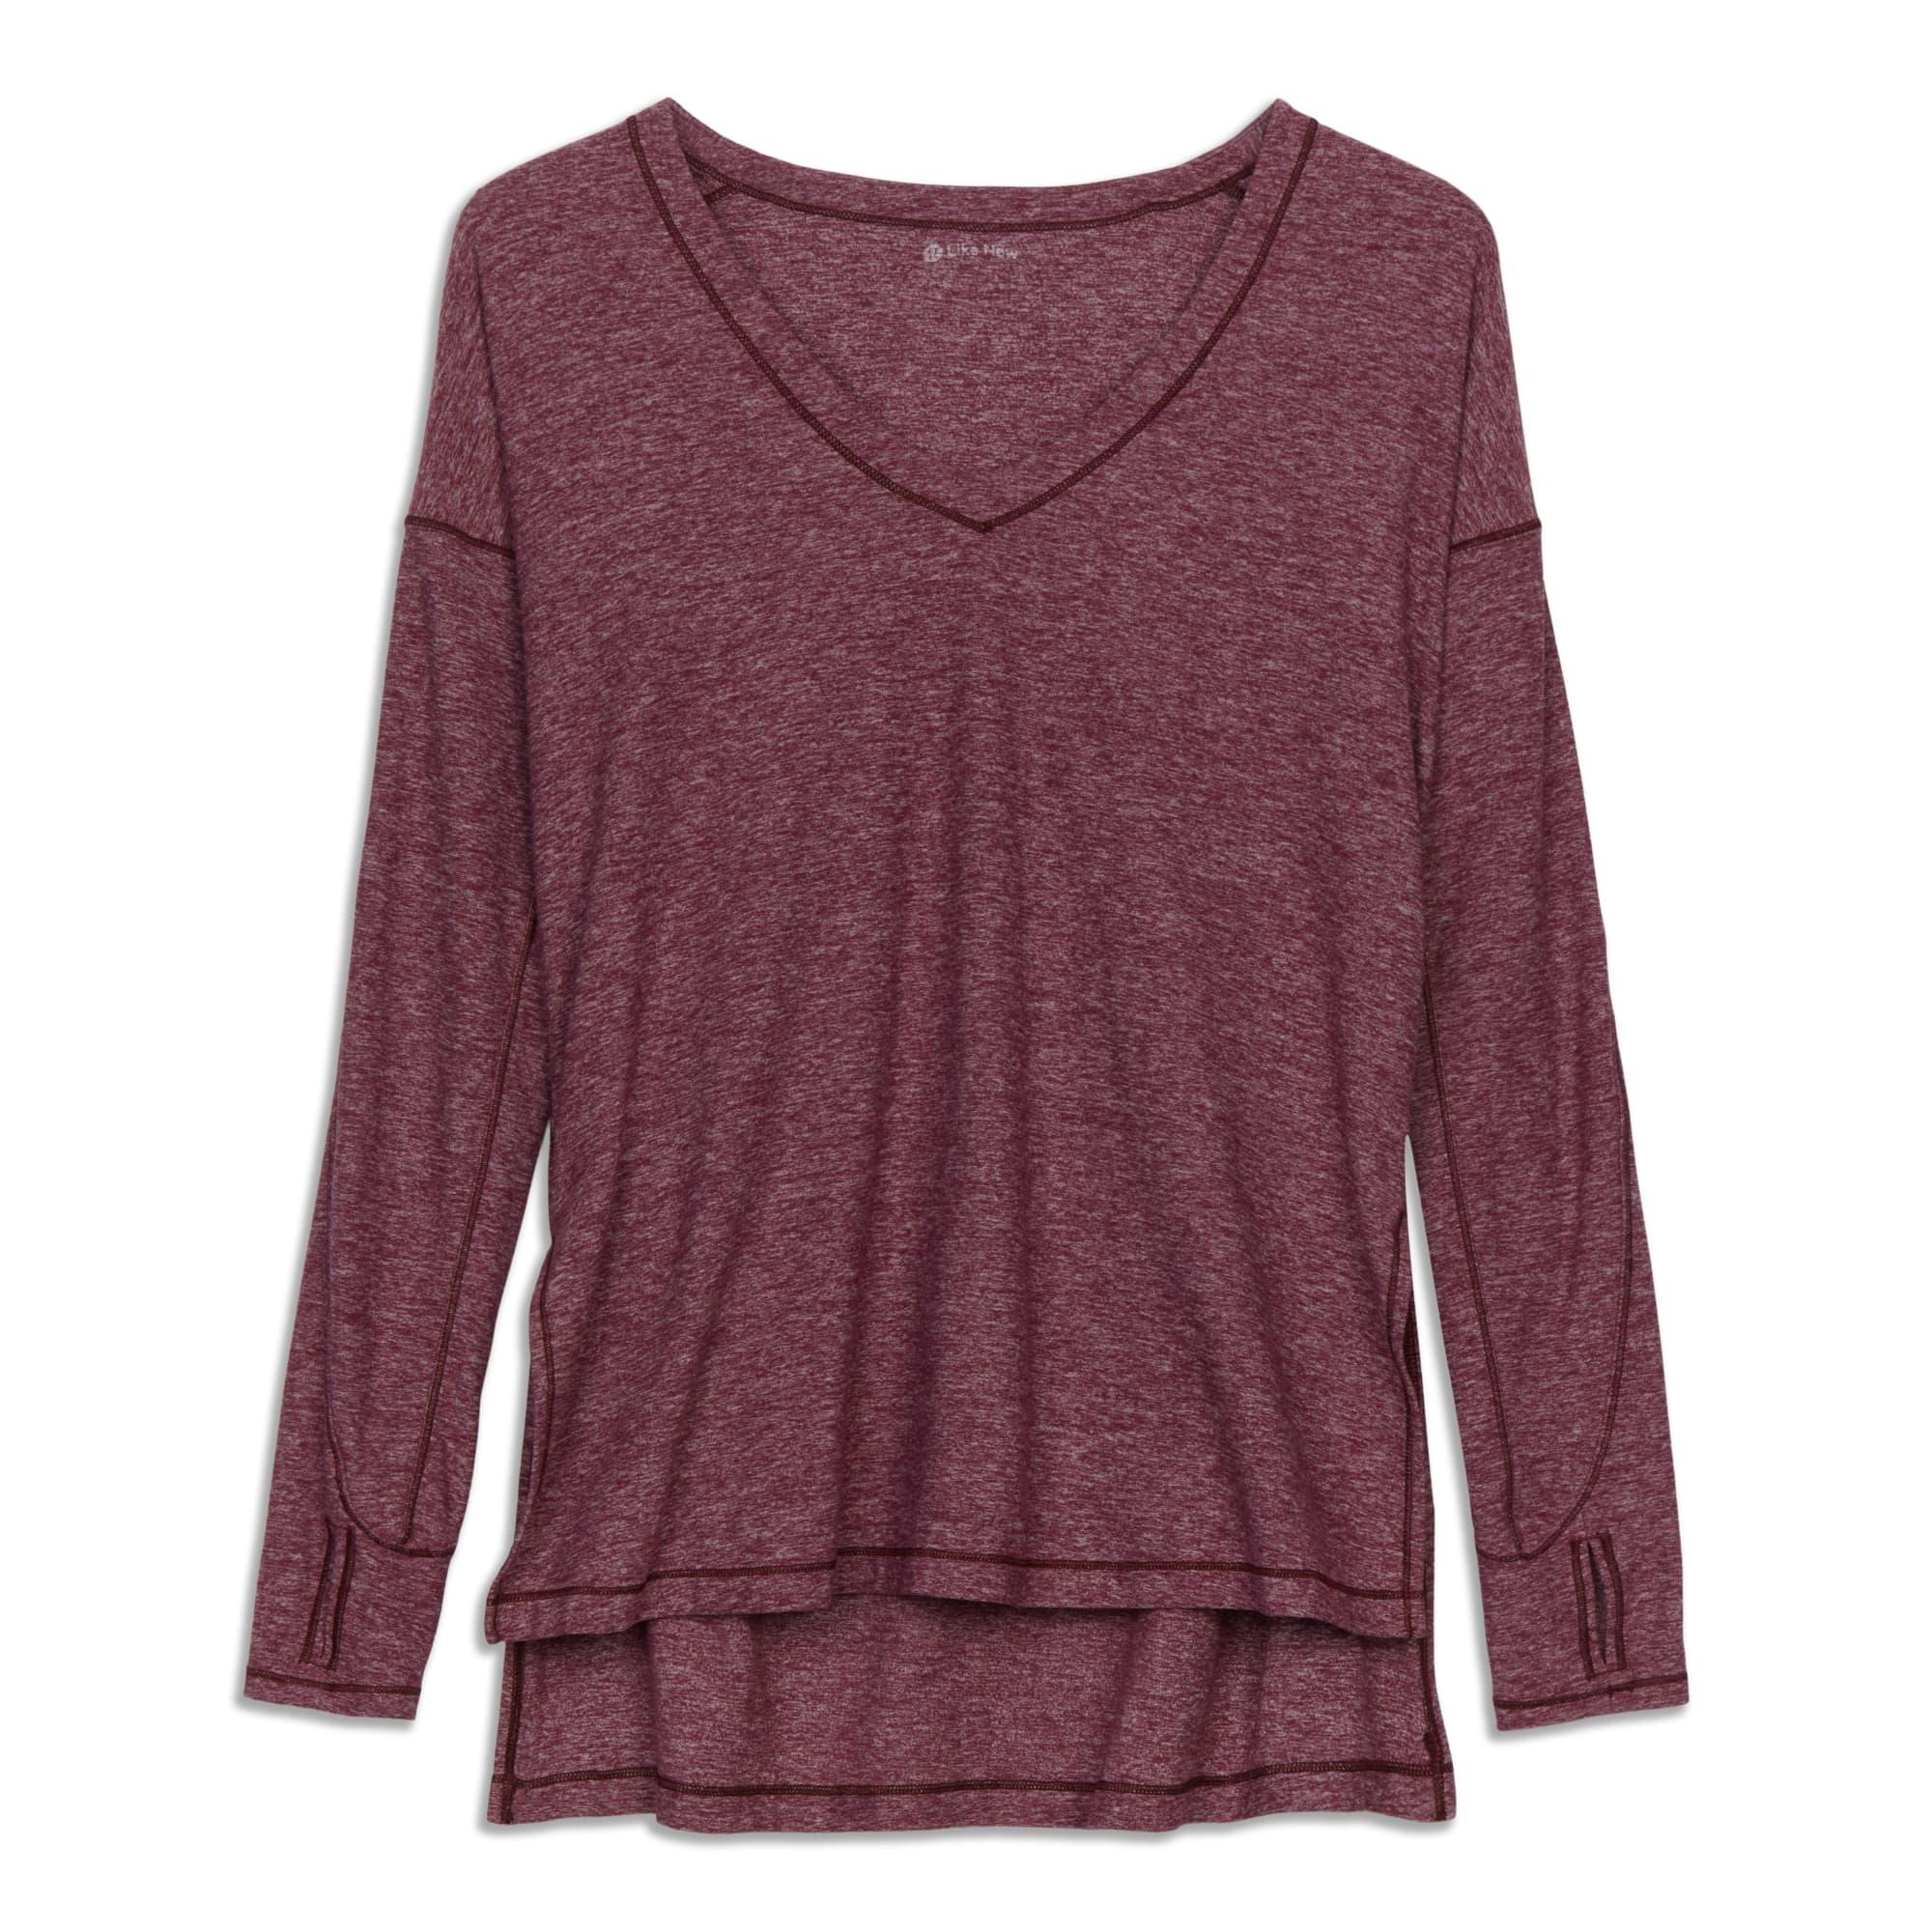 Main product image: Dash To Class Long Sleeve Shirt - Resale